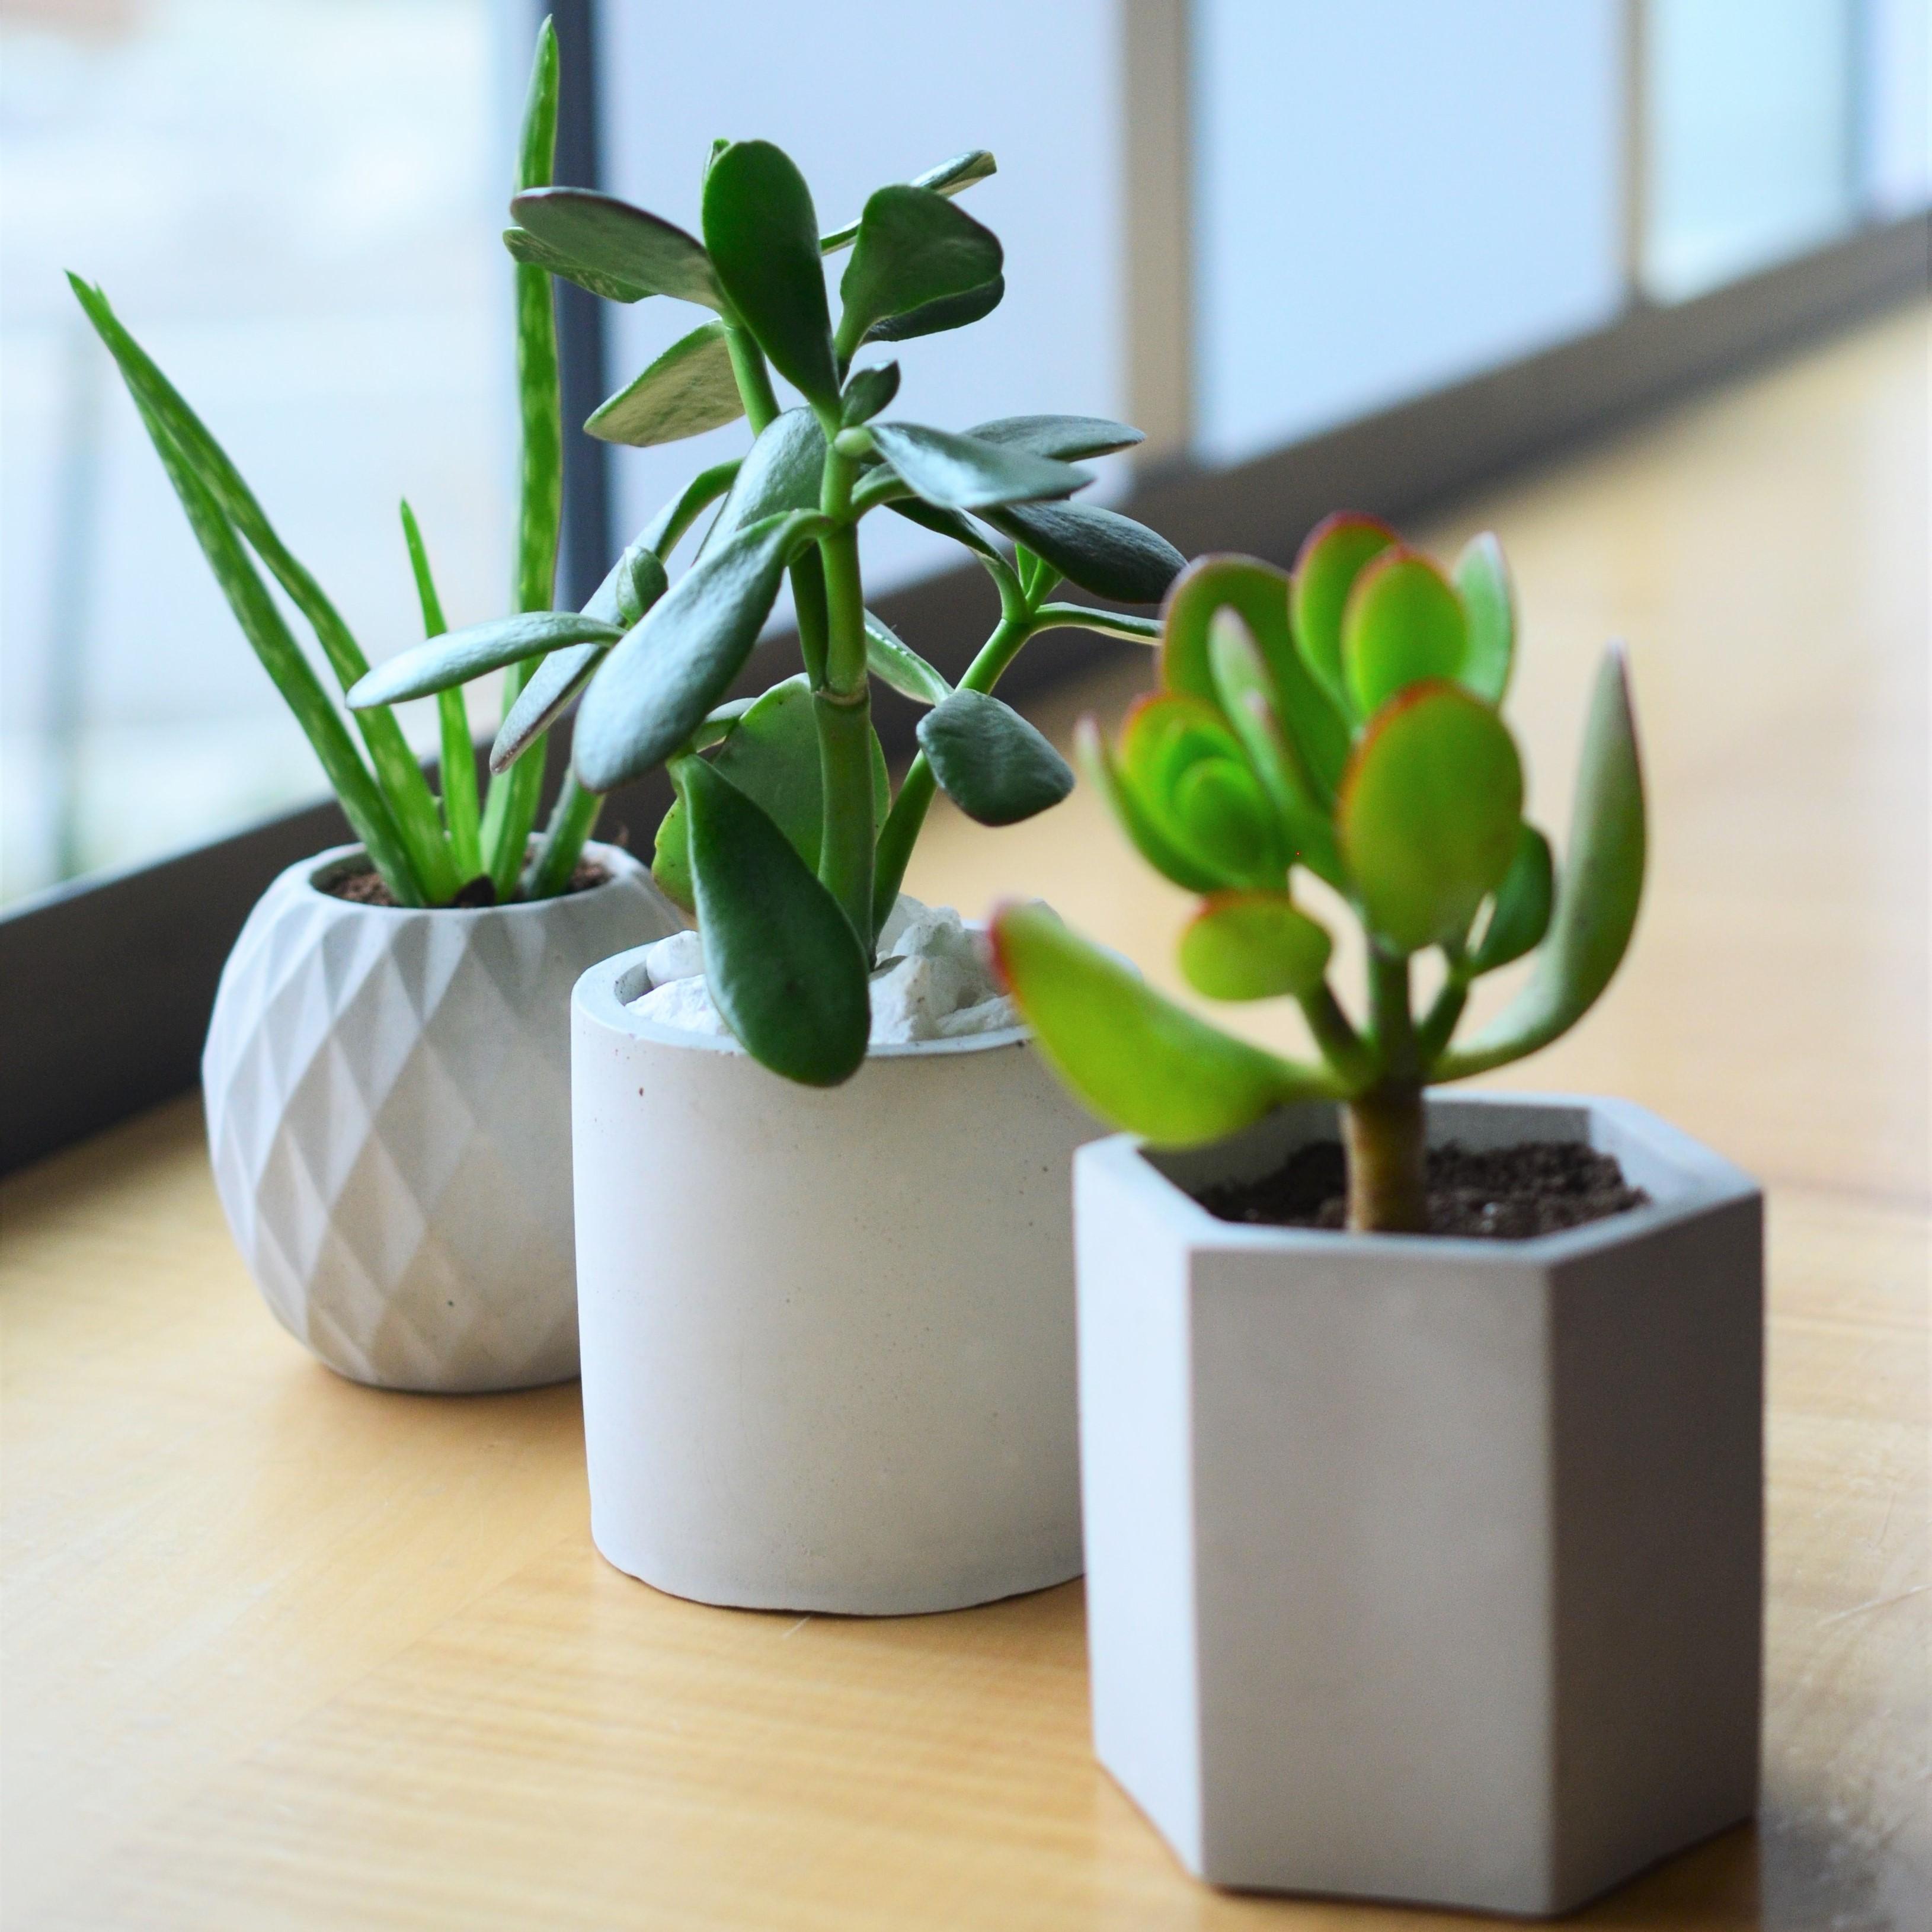 Photo of three geometric concrete planters, each holding a bright green succulent plant, set on a windowsill